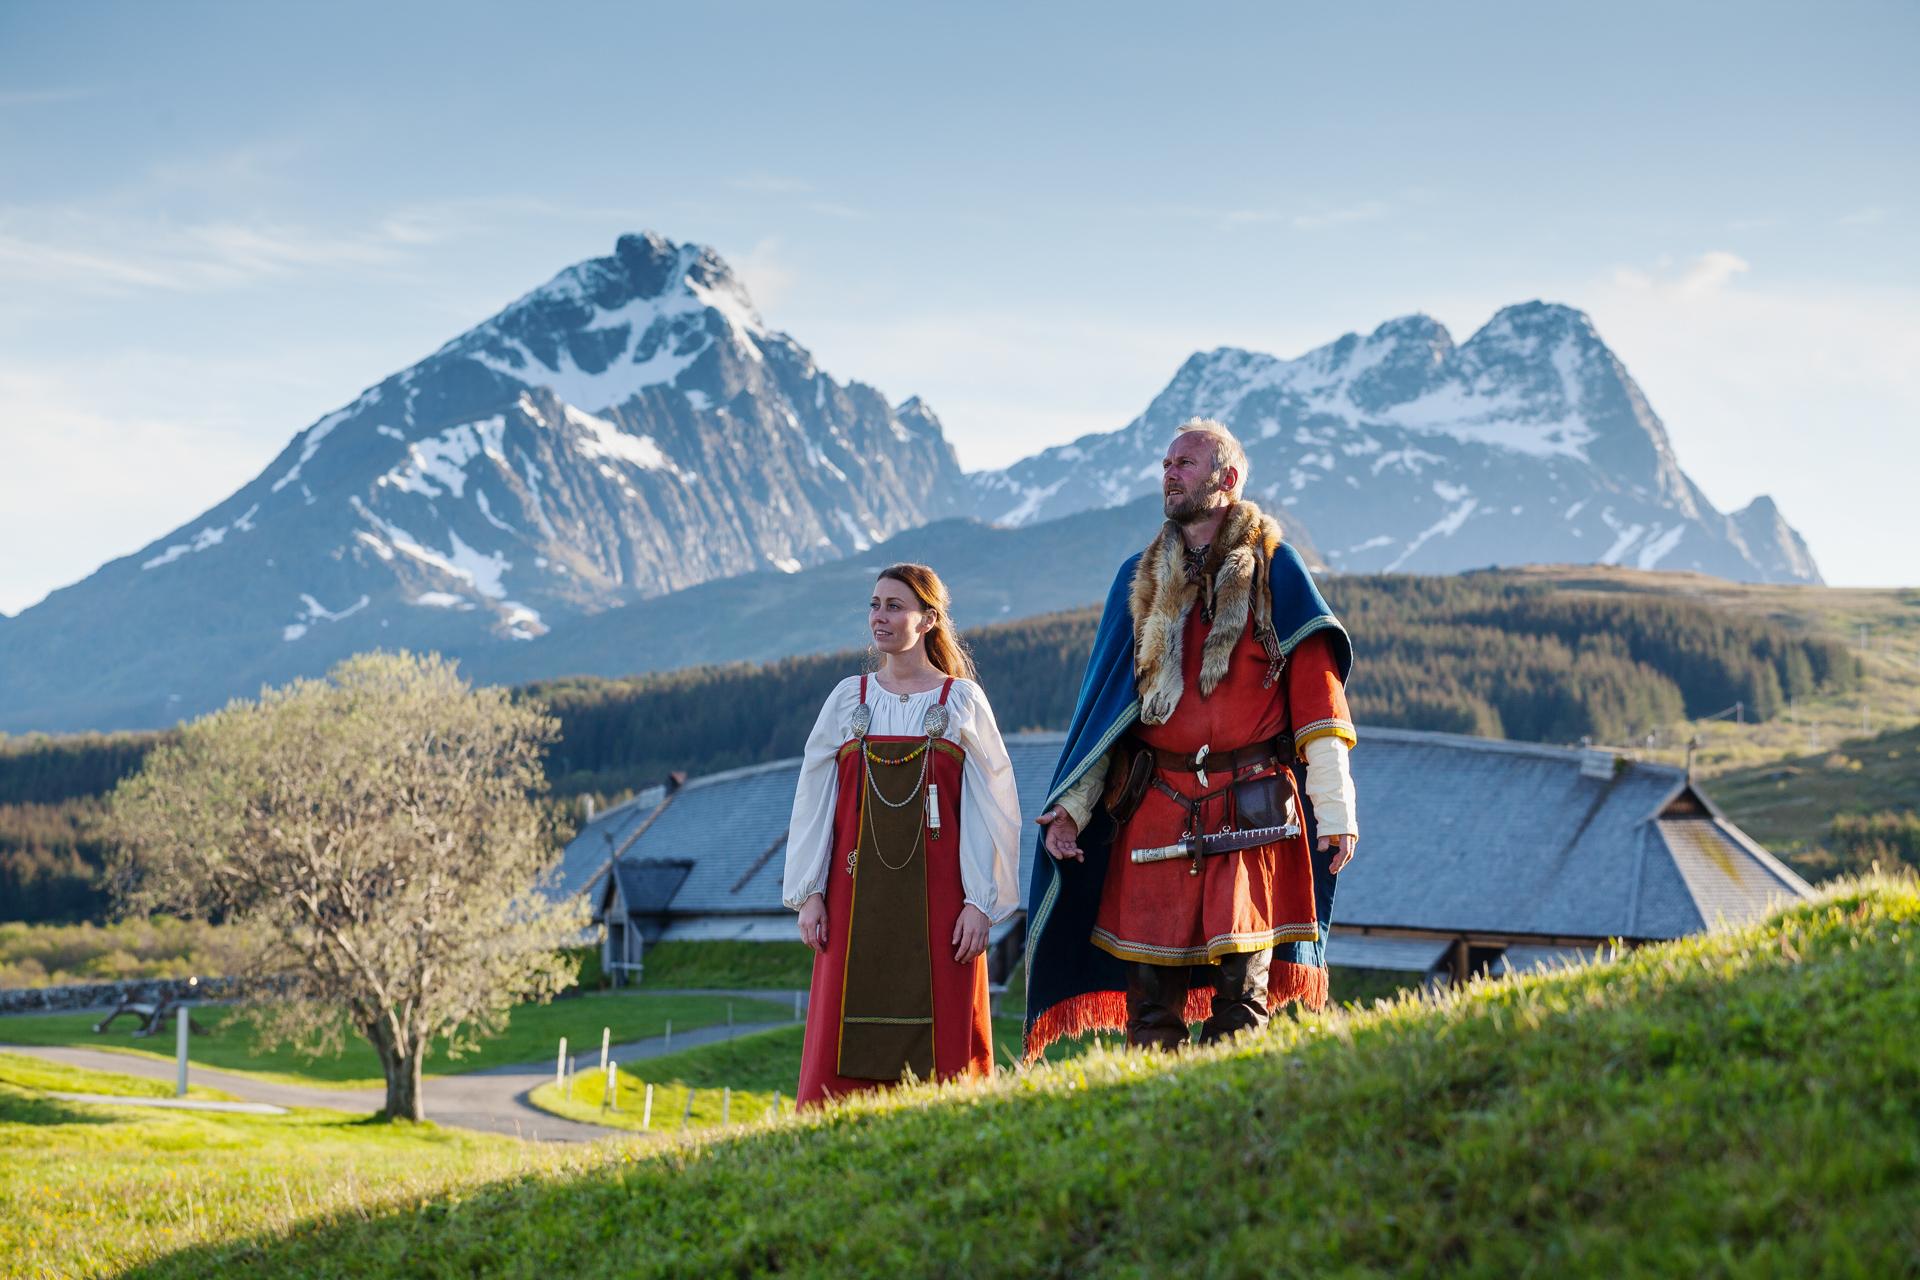 Ny besøksrekord ved Lofotr Vikingmuseum